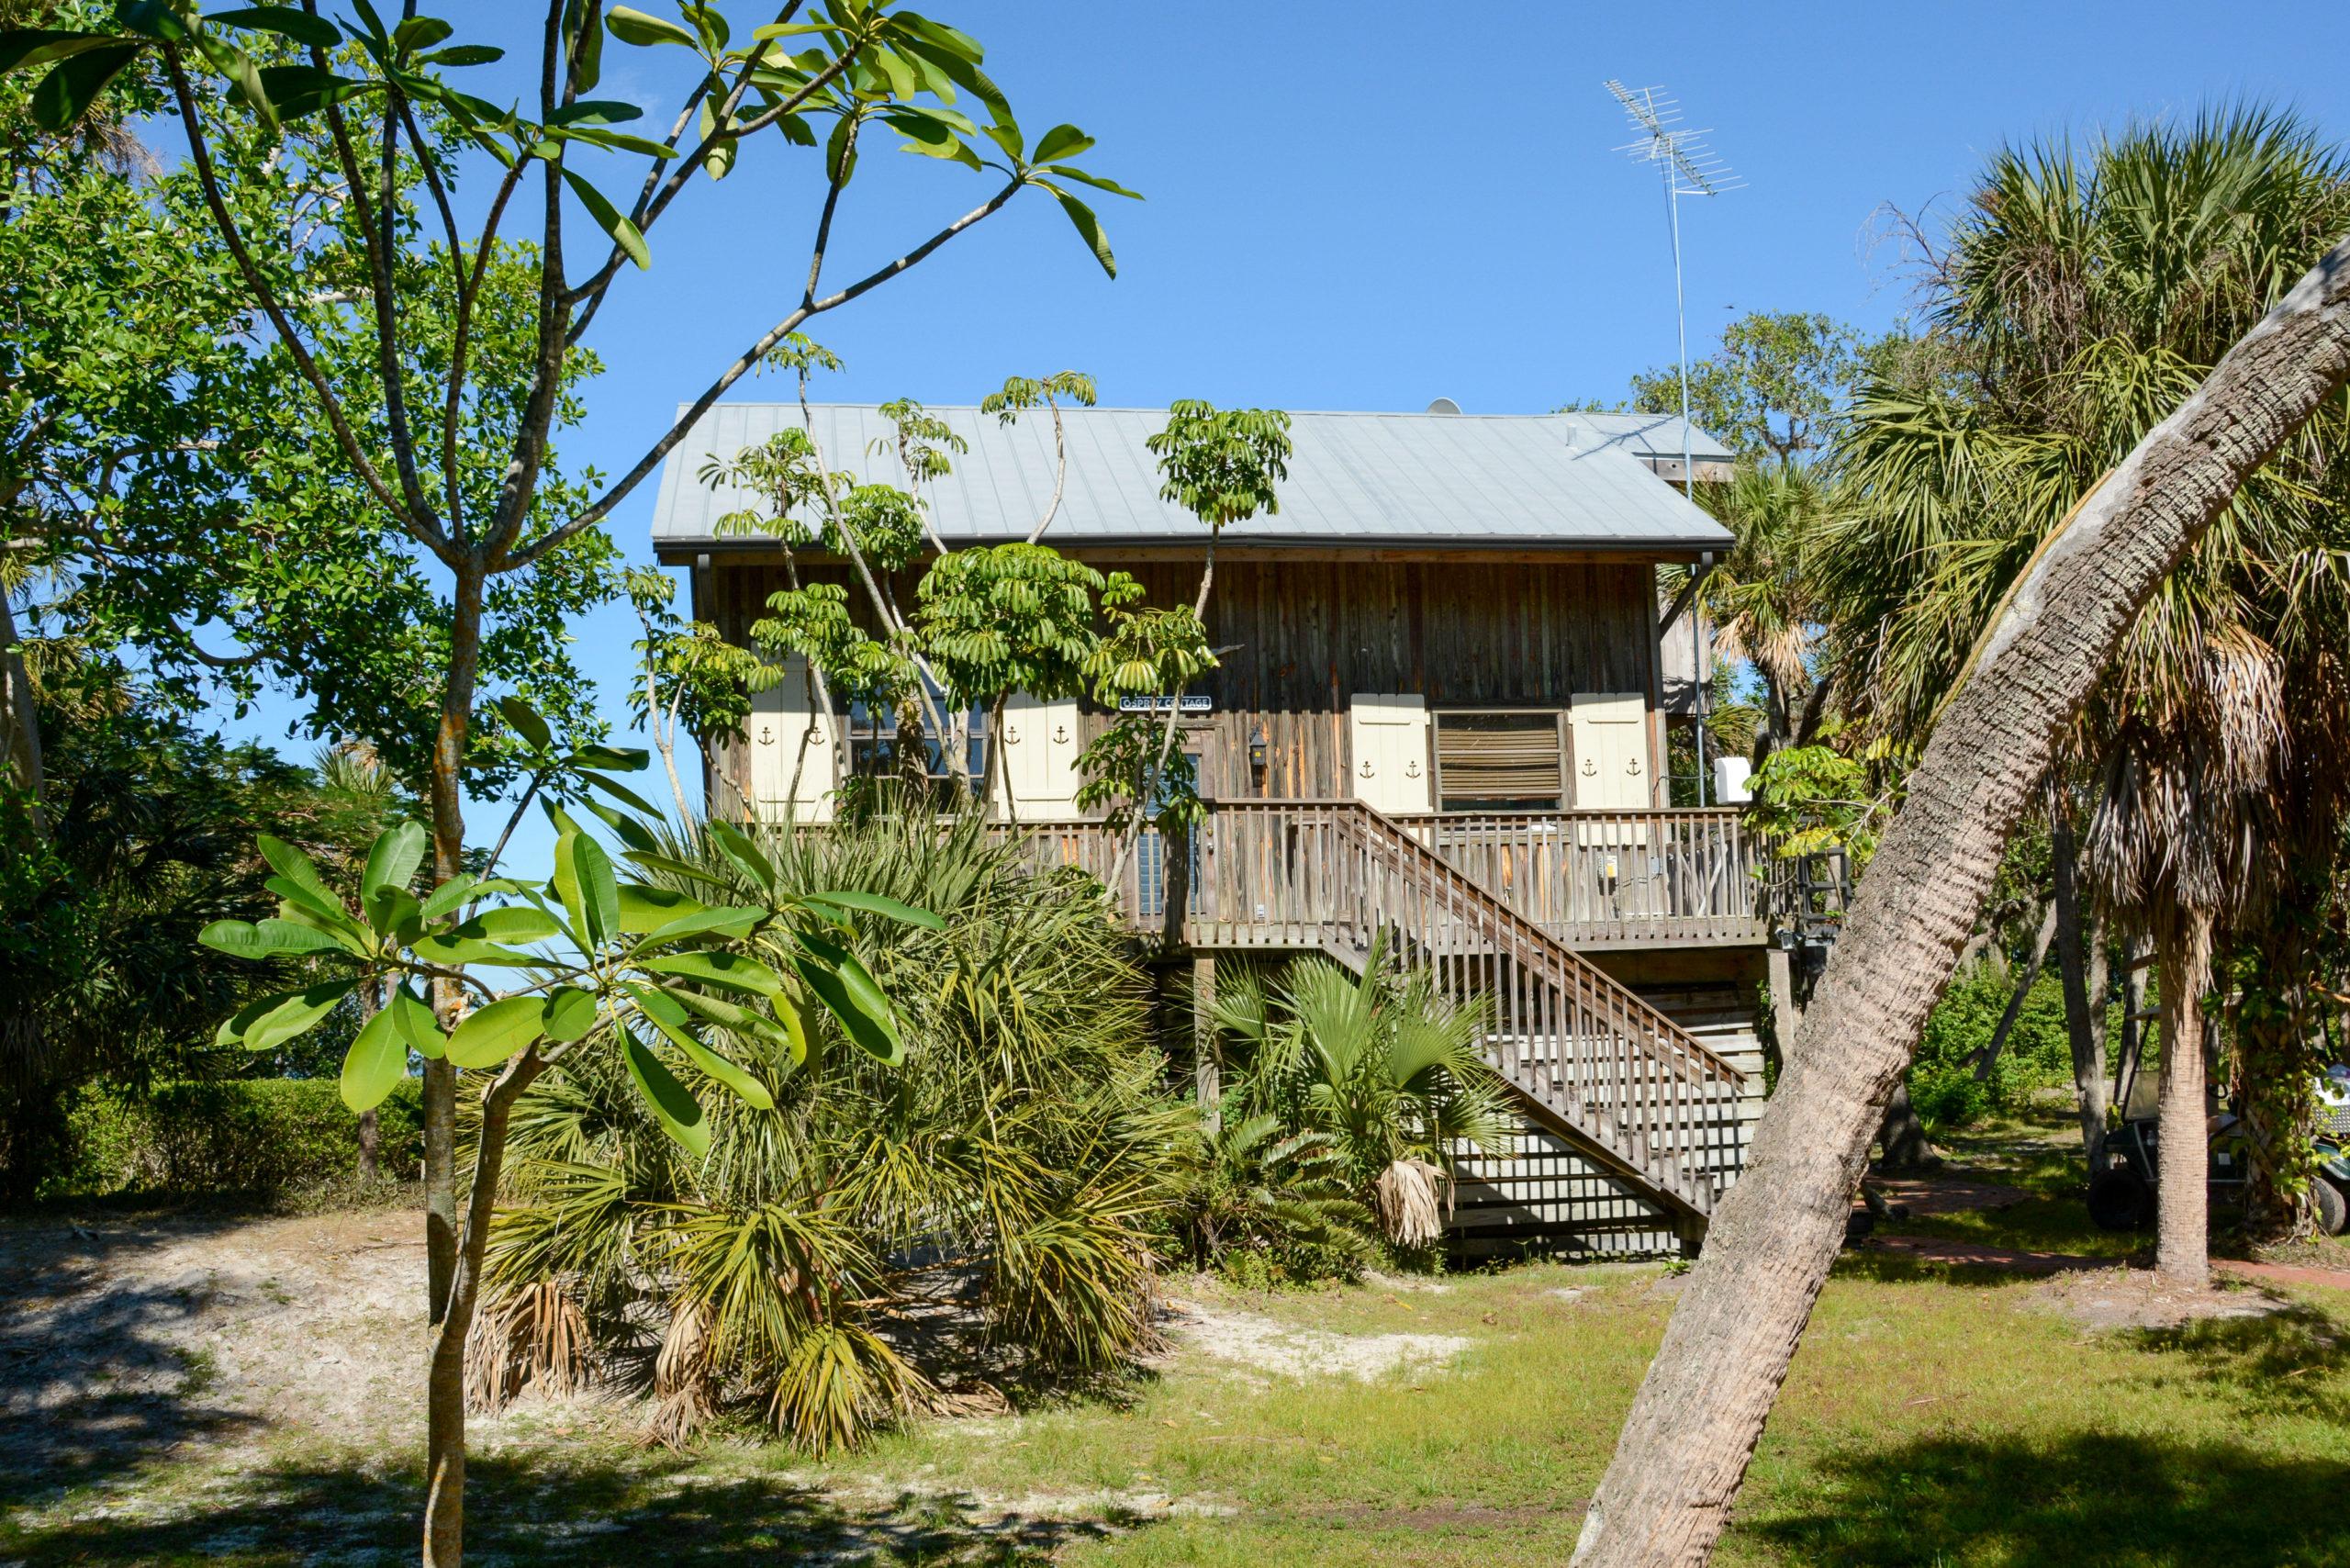 Die Insel Cabbage Key ist Gegenstand von Jimmy Buffett Song »Cheeseburger in Paradise«